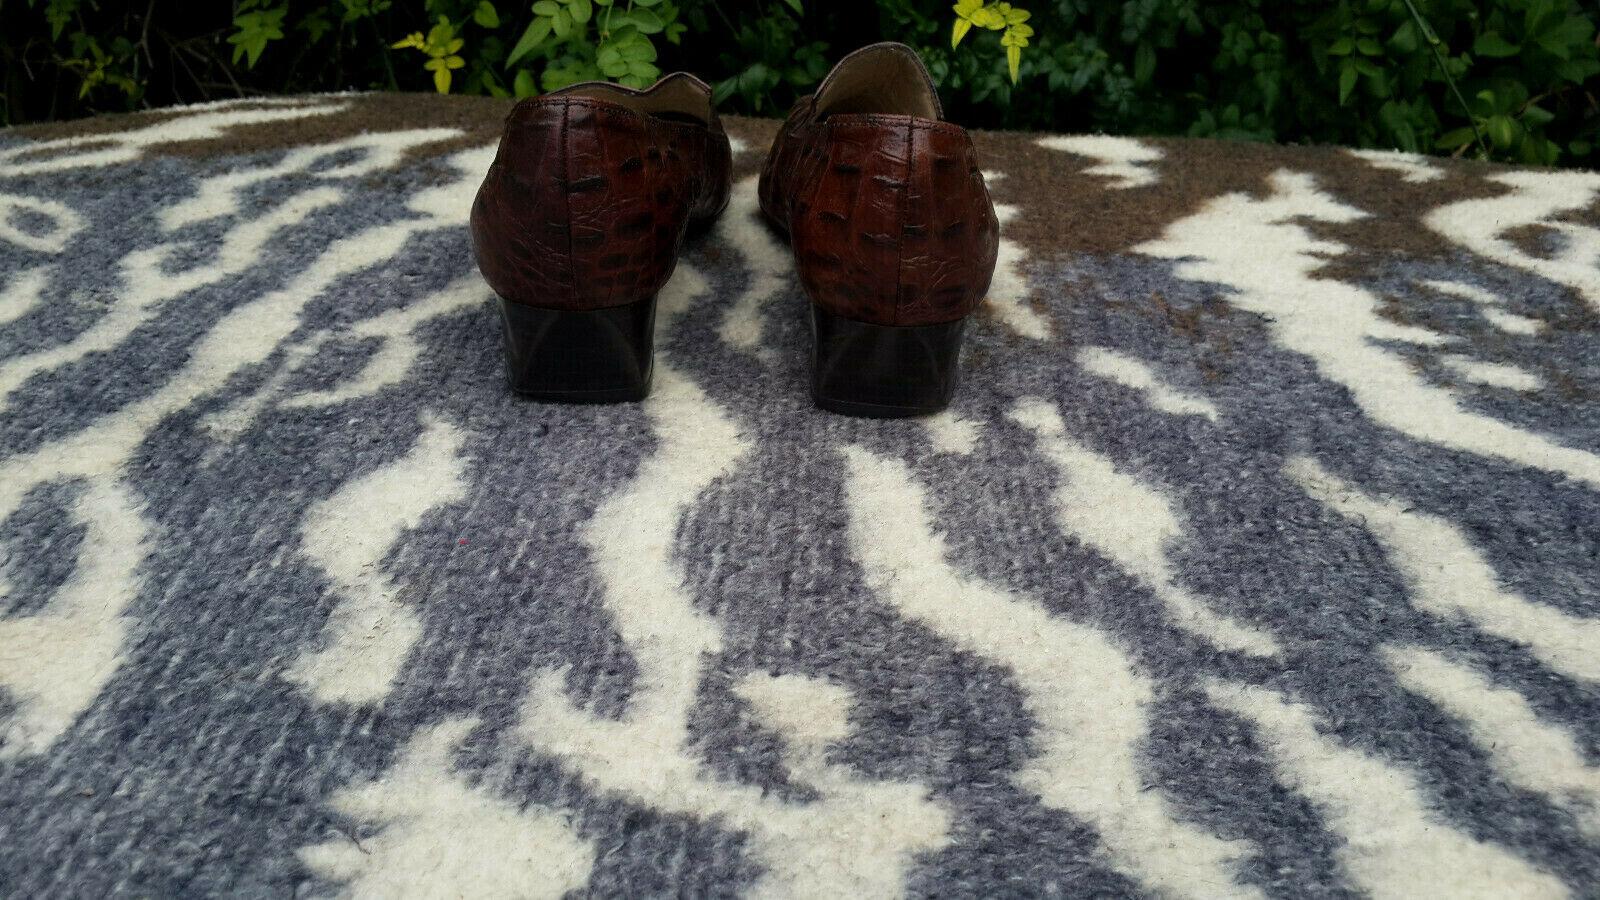 Peter Kaiser brown crocodile pattern pattern pattern leather shoes UK size 5.5 EU size 38.5 dfe0cb